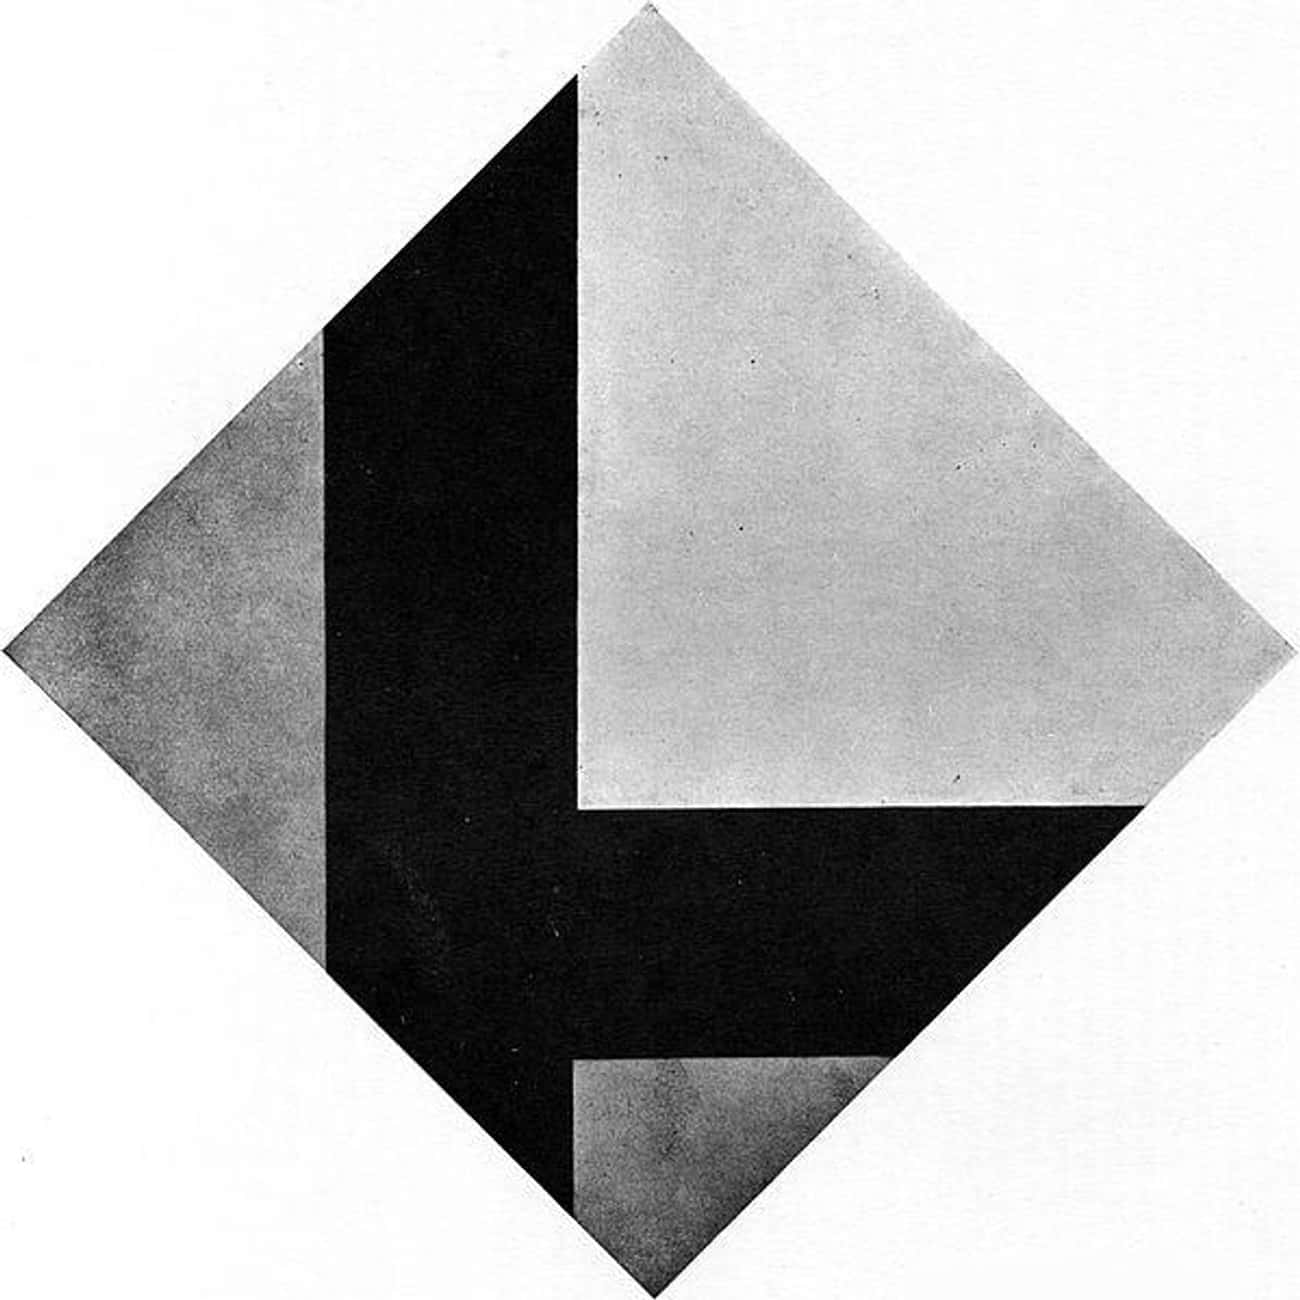 Counter-Composition VIII